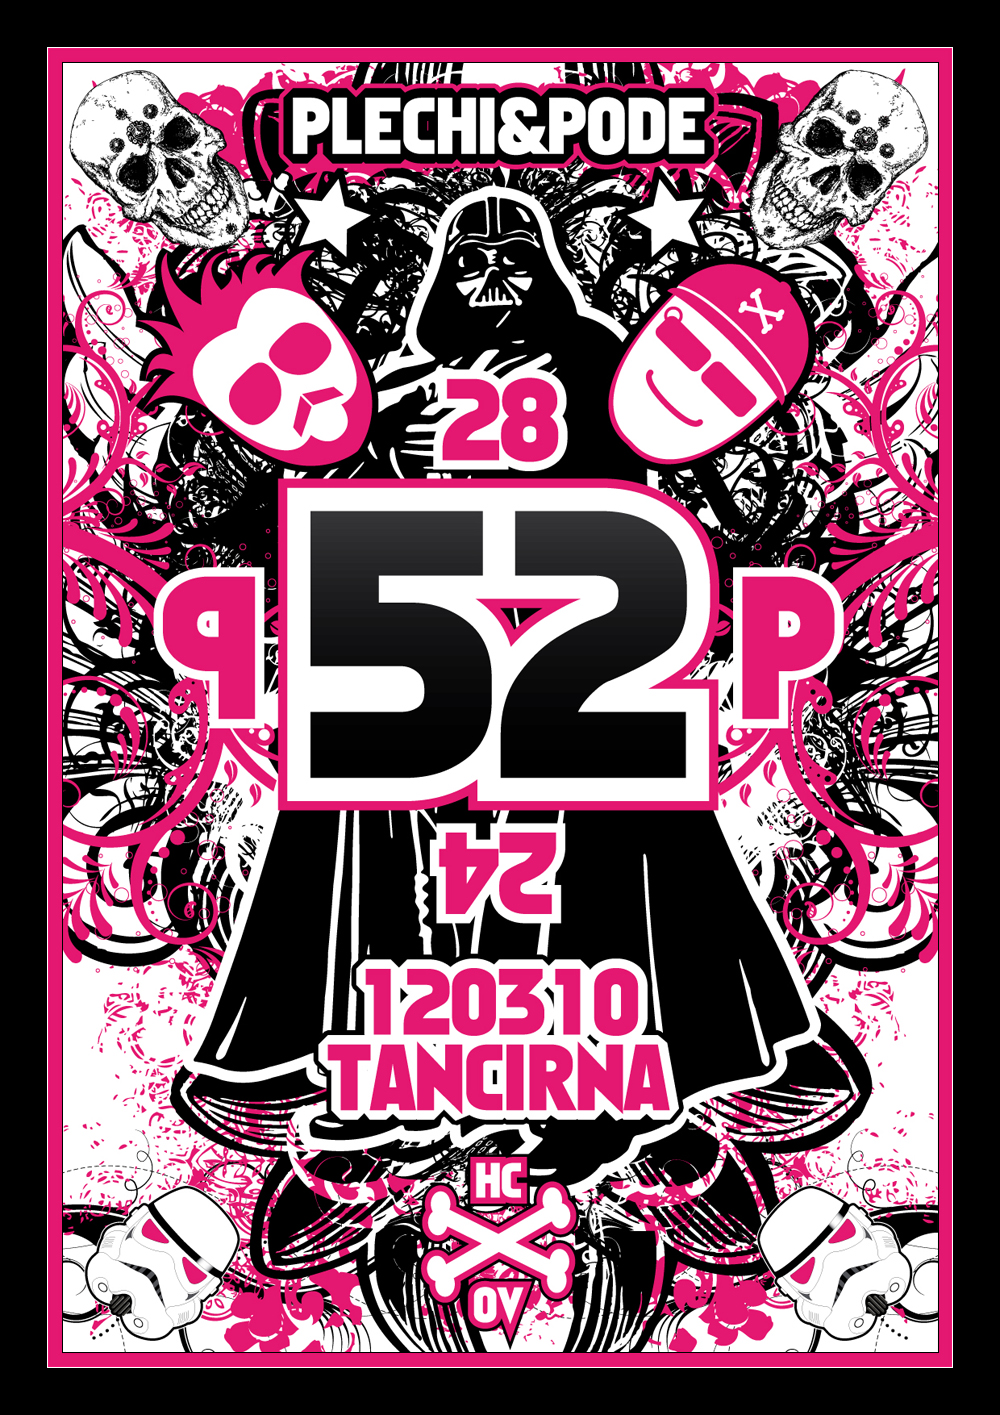 B day poster designs - Birthday Poster By Plechi Birthday Poster By Plechi